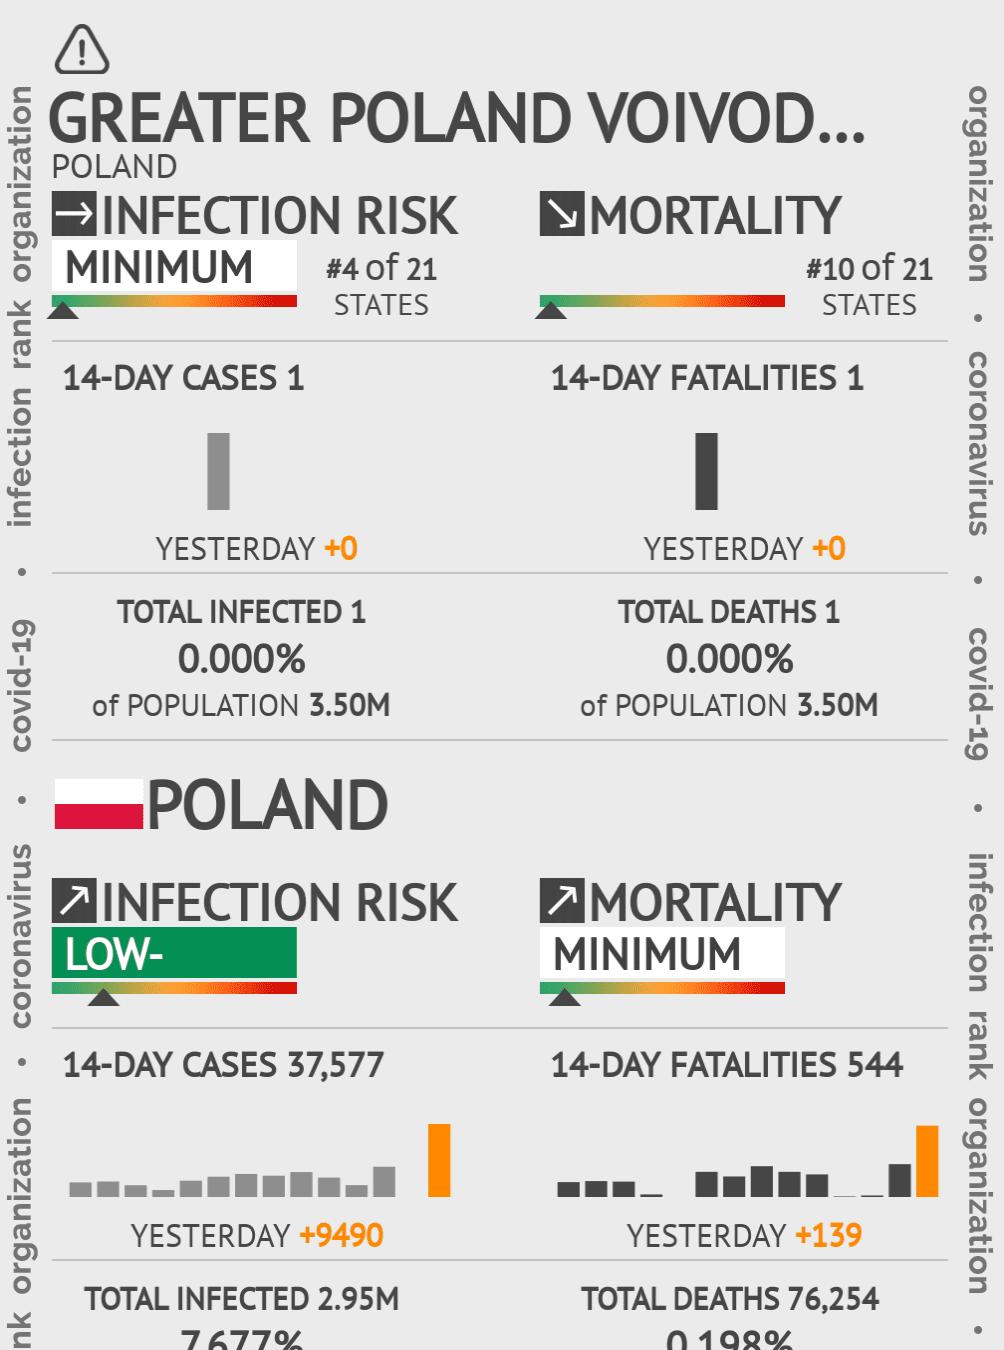 Wielkopolskie Coronavirus Covid-19 Risk of Infection on December 10, 2020